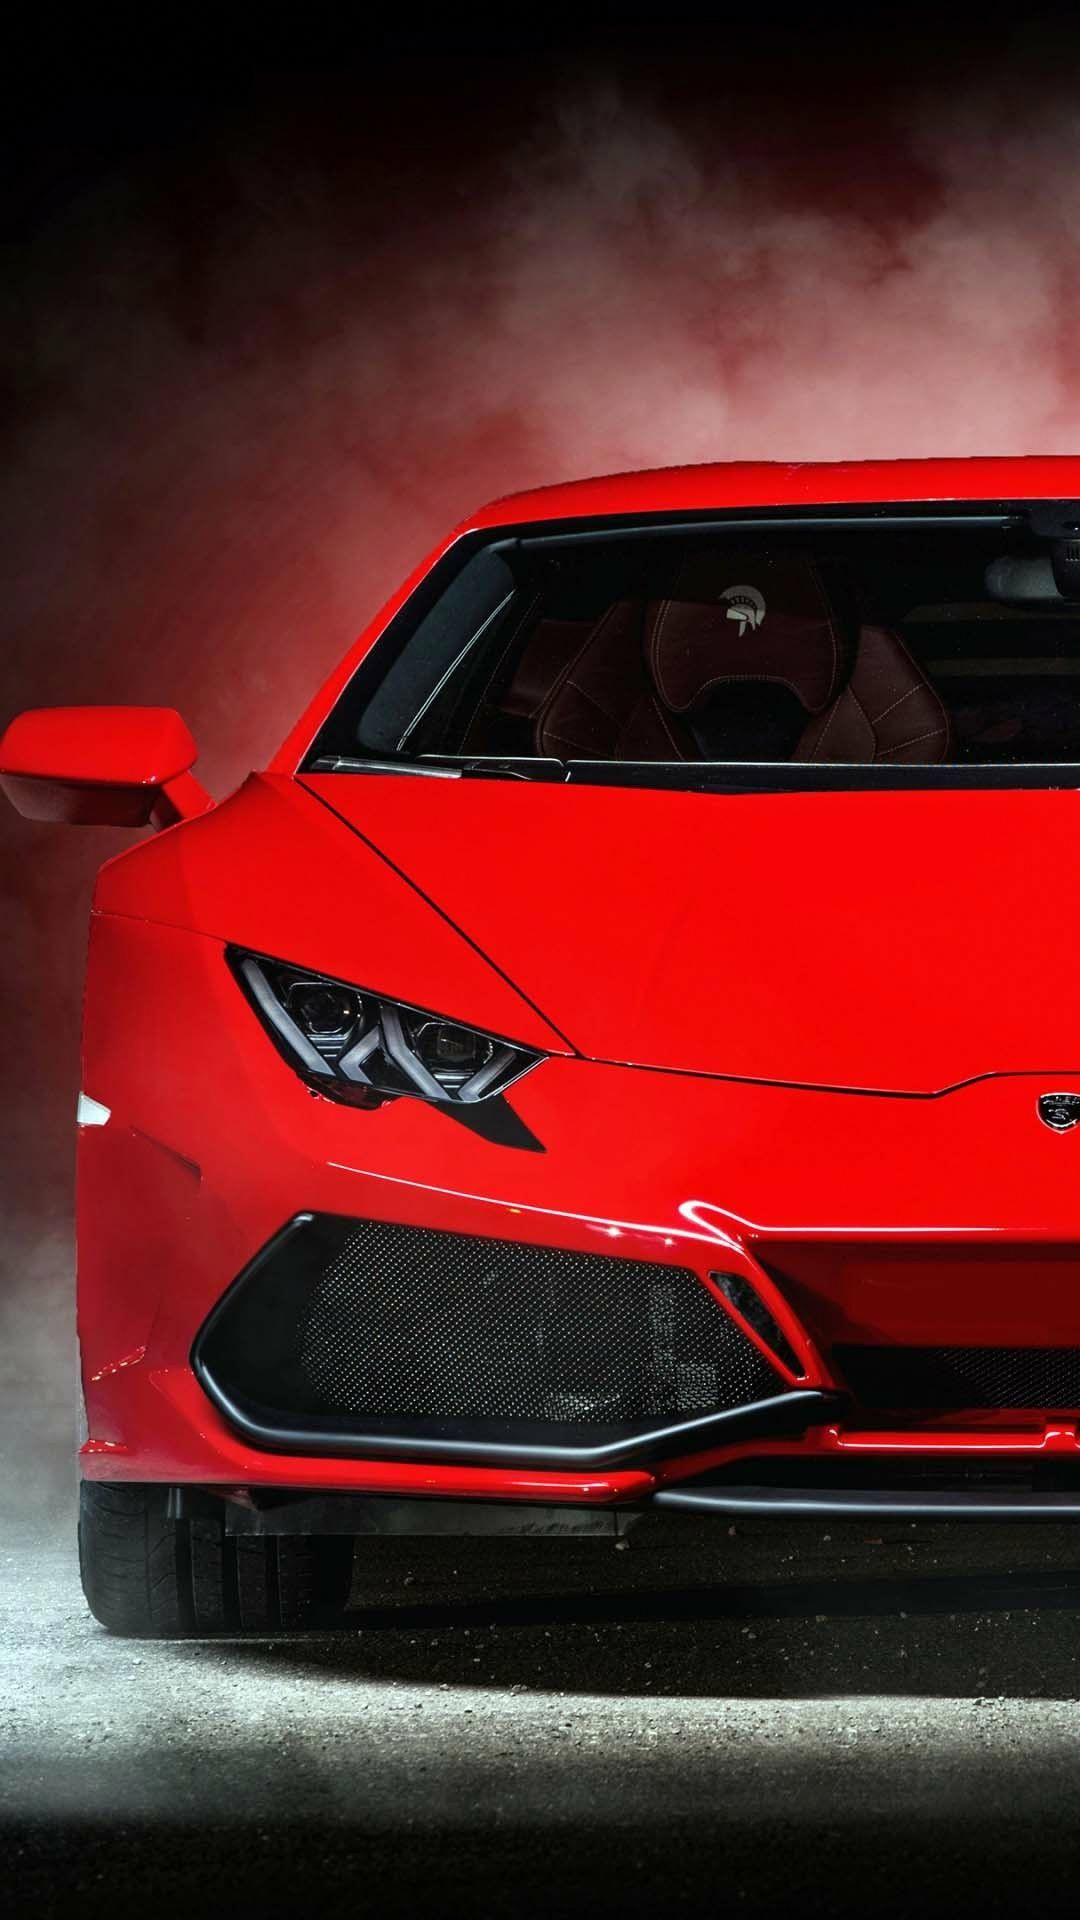 lamborghini aventador #luxurysportscars | autos de lujo | mustangs